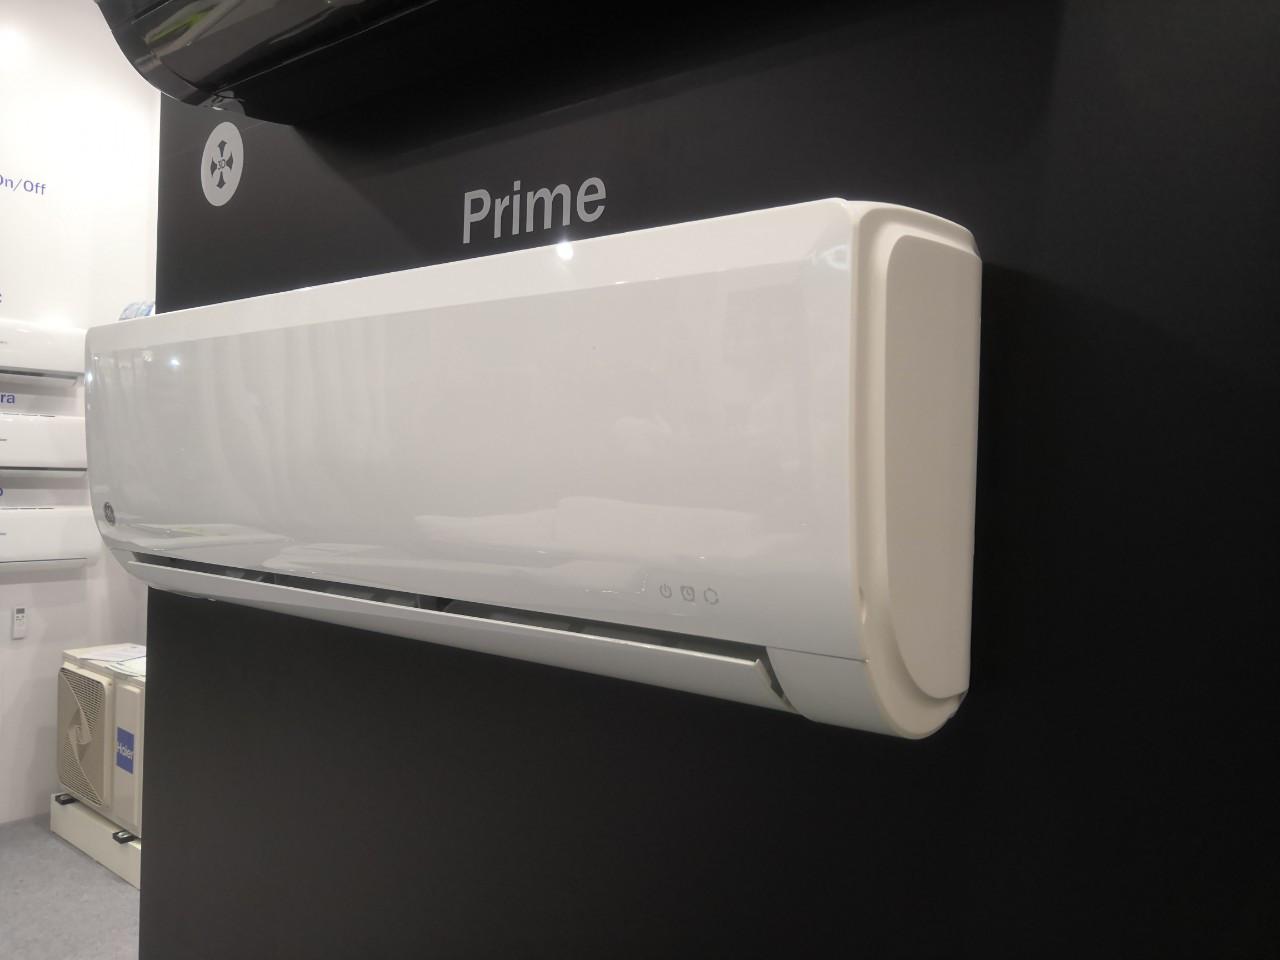 НОВИНКА!!! Кондиционер General Electric PRIME GES-NMG70IN Invertor (-15oC)